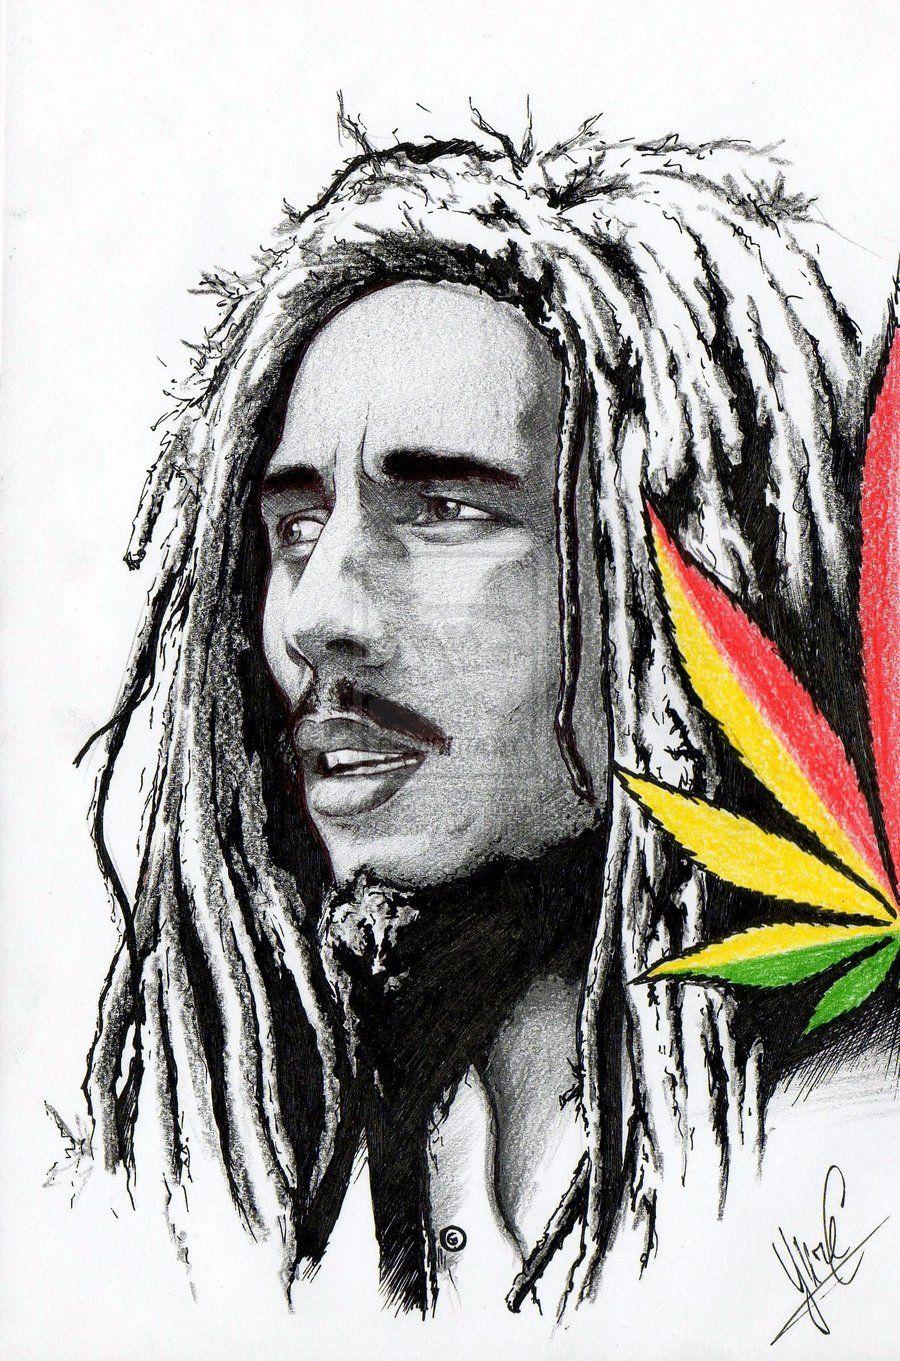 Imagem Do Reggae ~ Hi Bob What gonna you do Bob ideas Pinterest Bobs, Bob marley and Drawings